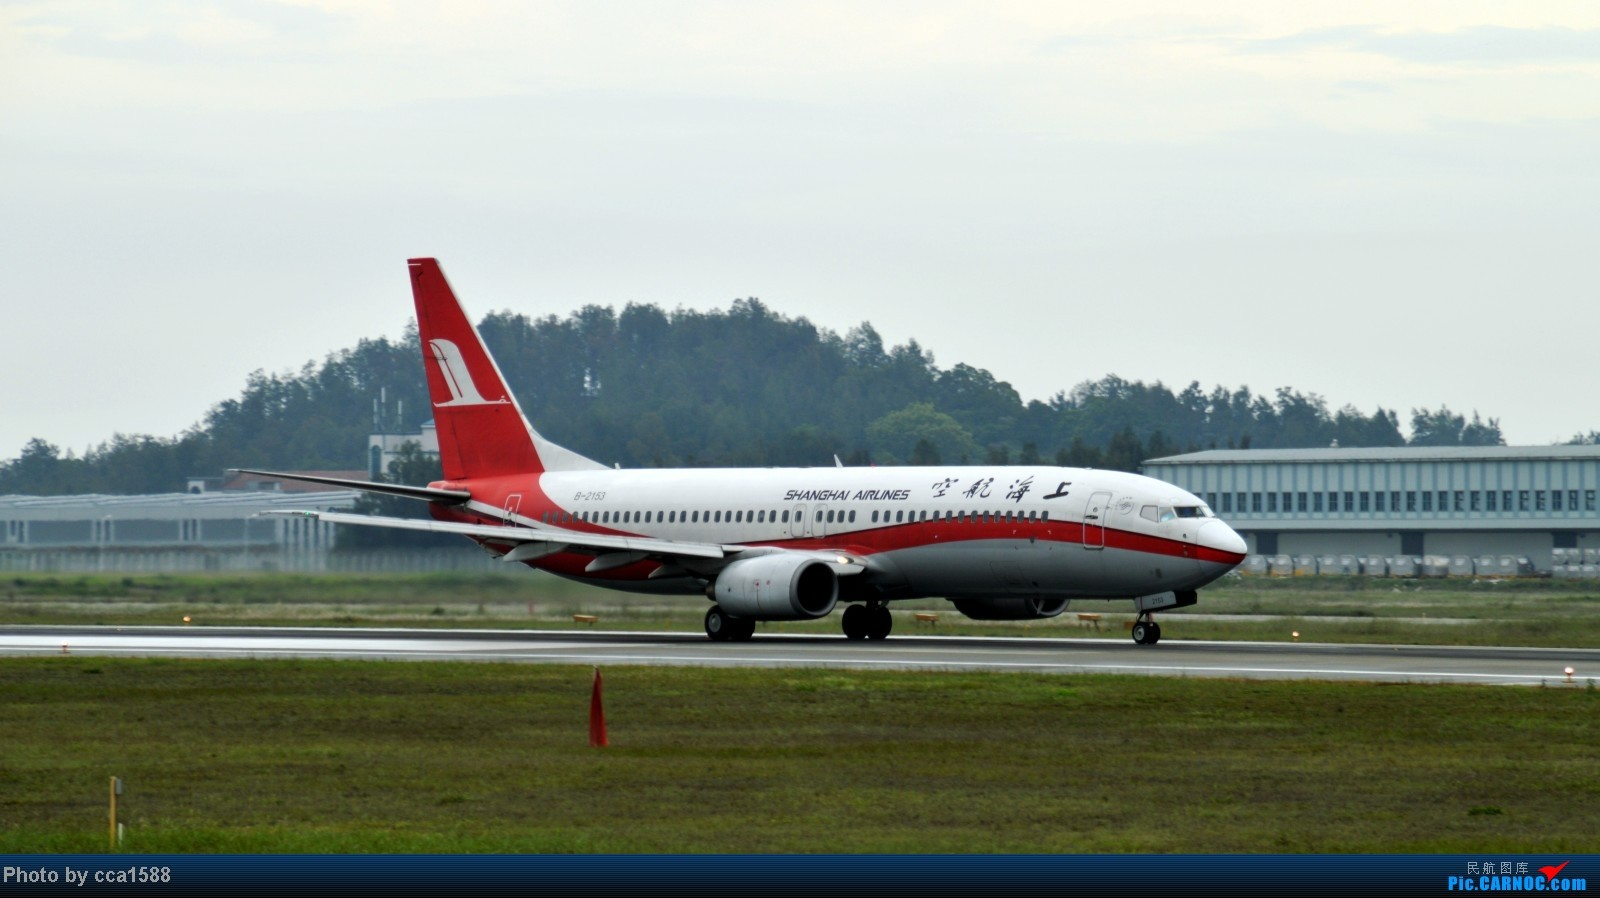 Re:[原创]4.26FOC拍机--烂天出好机,各种奇葩货~~ BOEING 737-800 B-2153 中国福州长乐机场